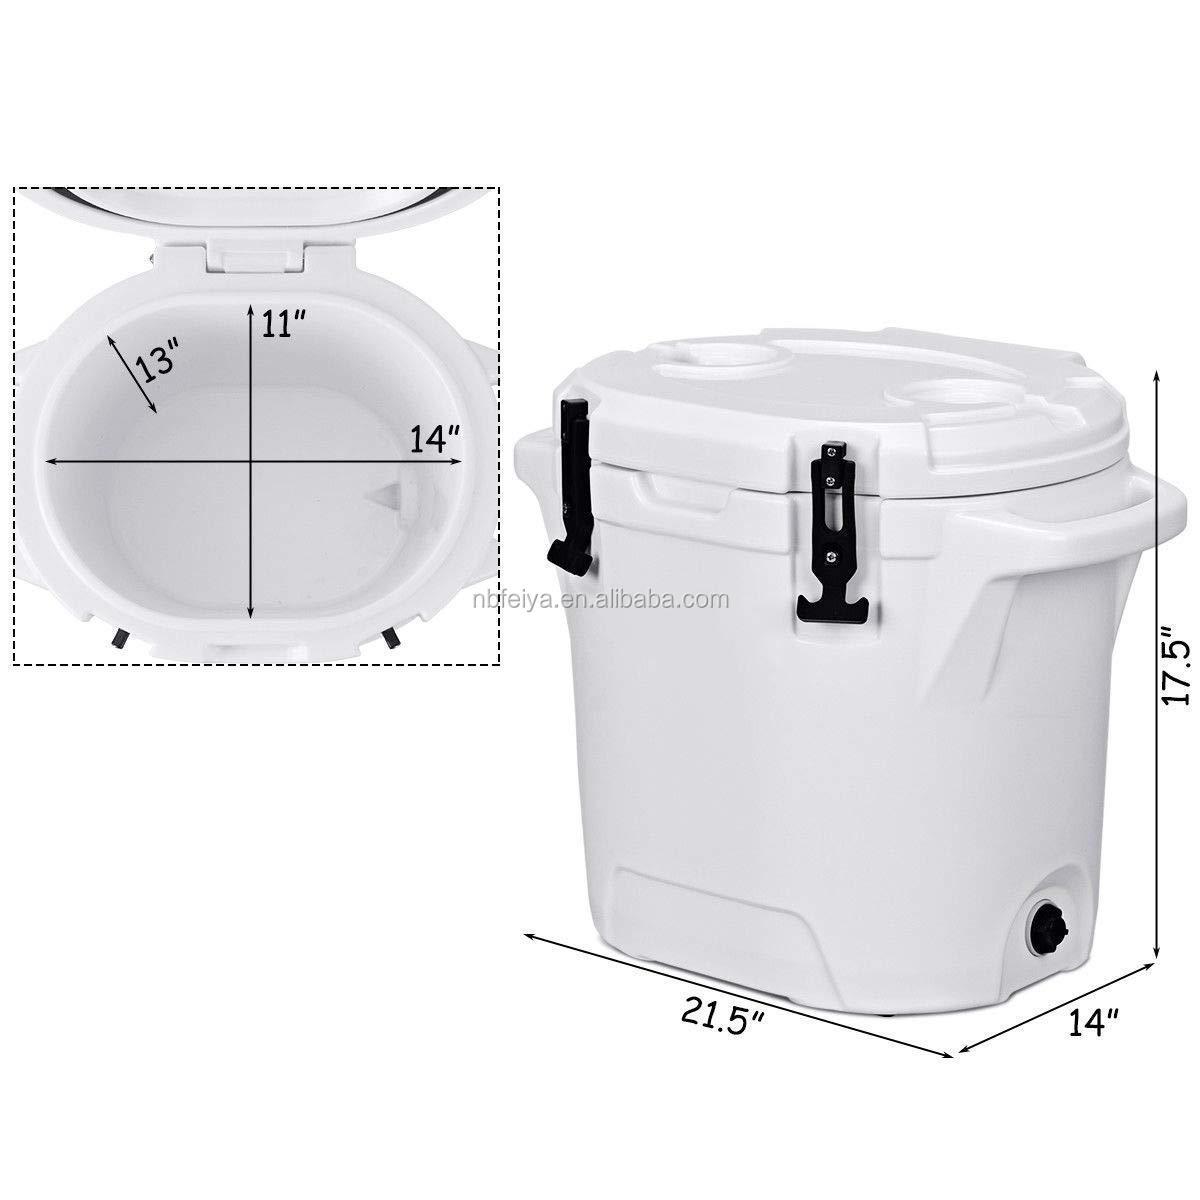 25L plastic rotomolded round spigot ice barrel cooler